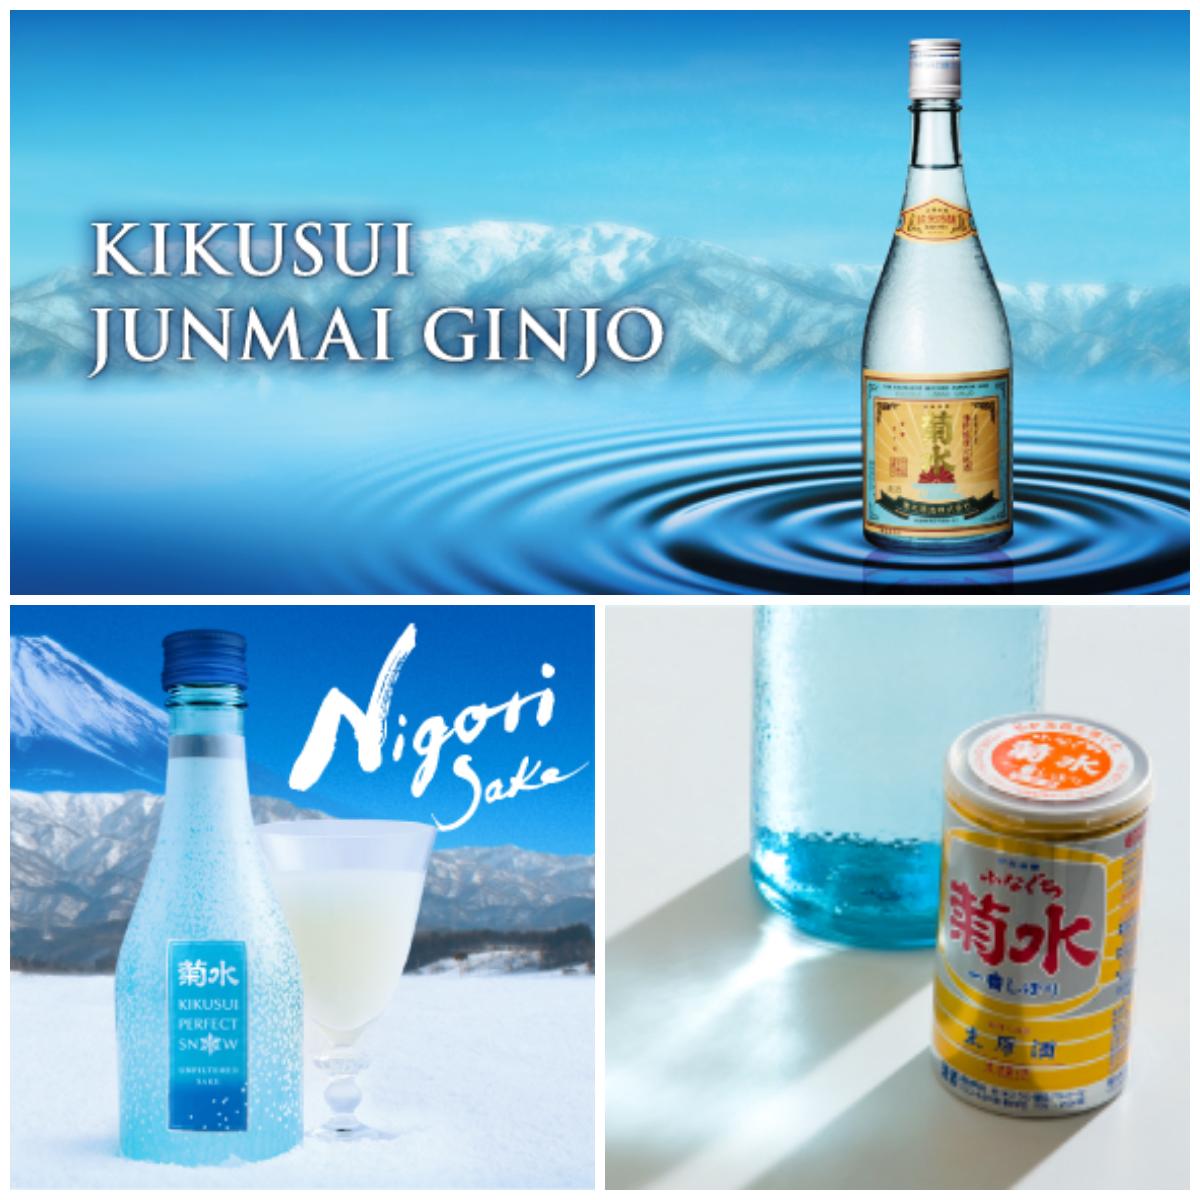 Kikusui Sake Tasting Banner